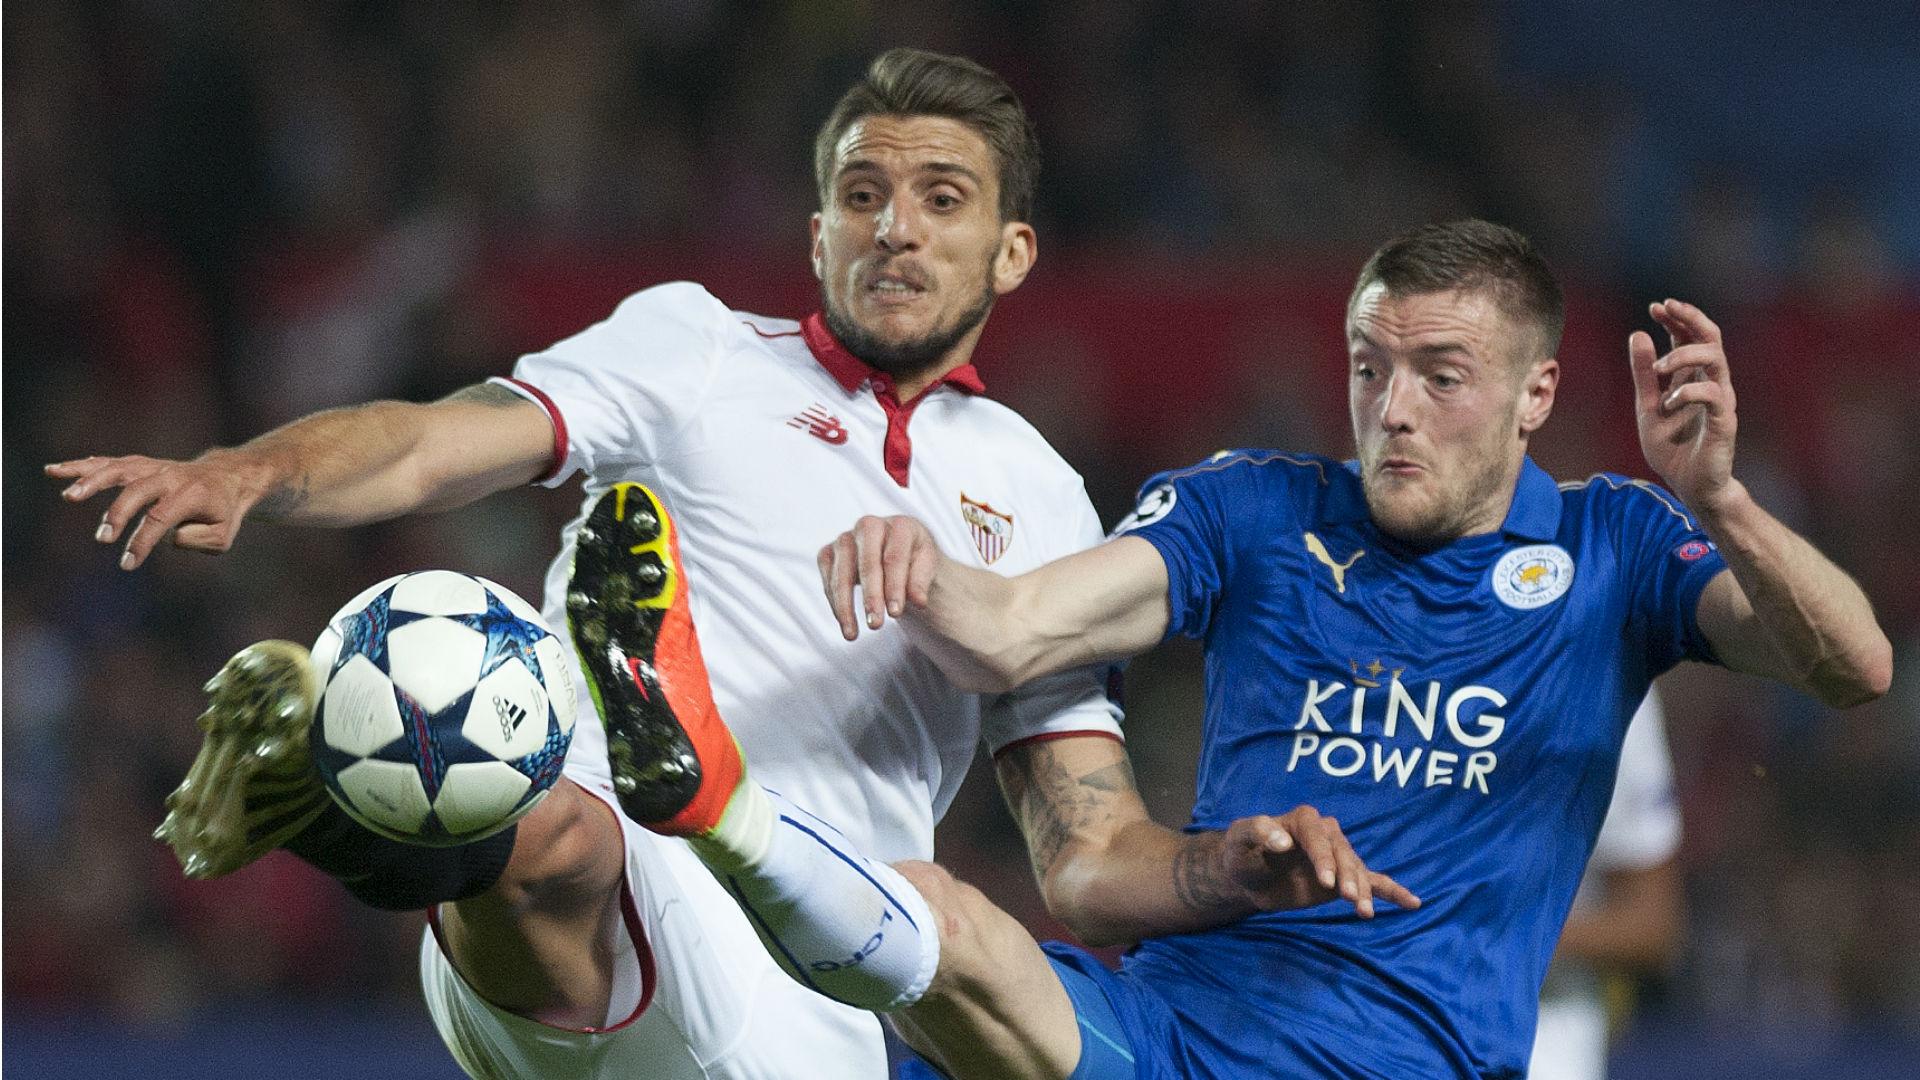 Daniel Carrico Jamie Vardy Sevilla Leicester City Champions League 022217